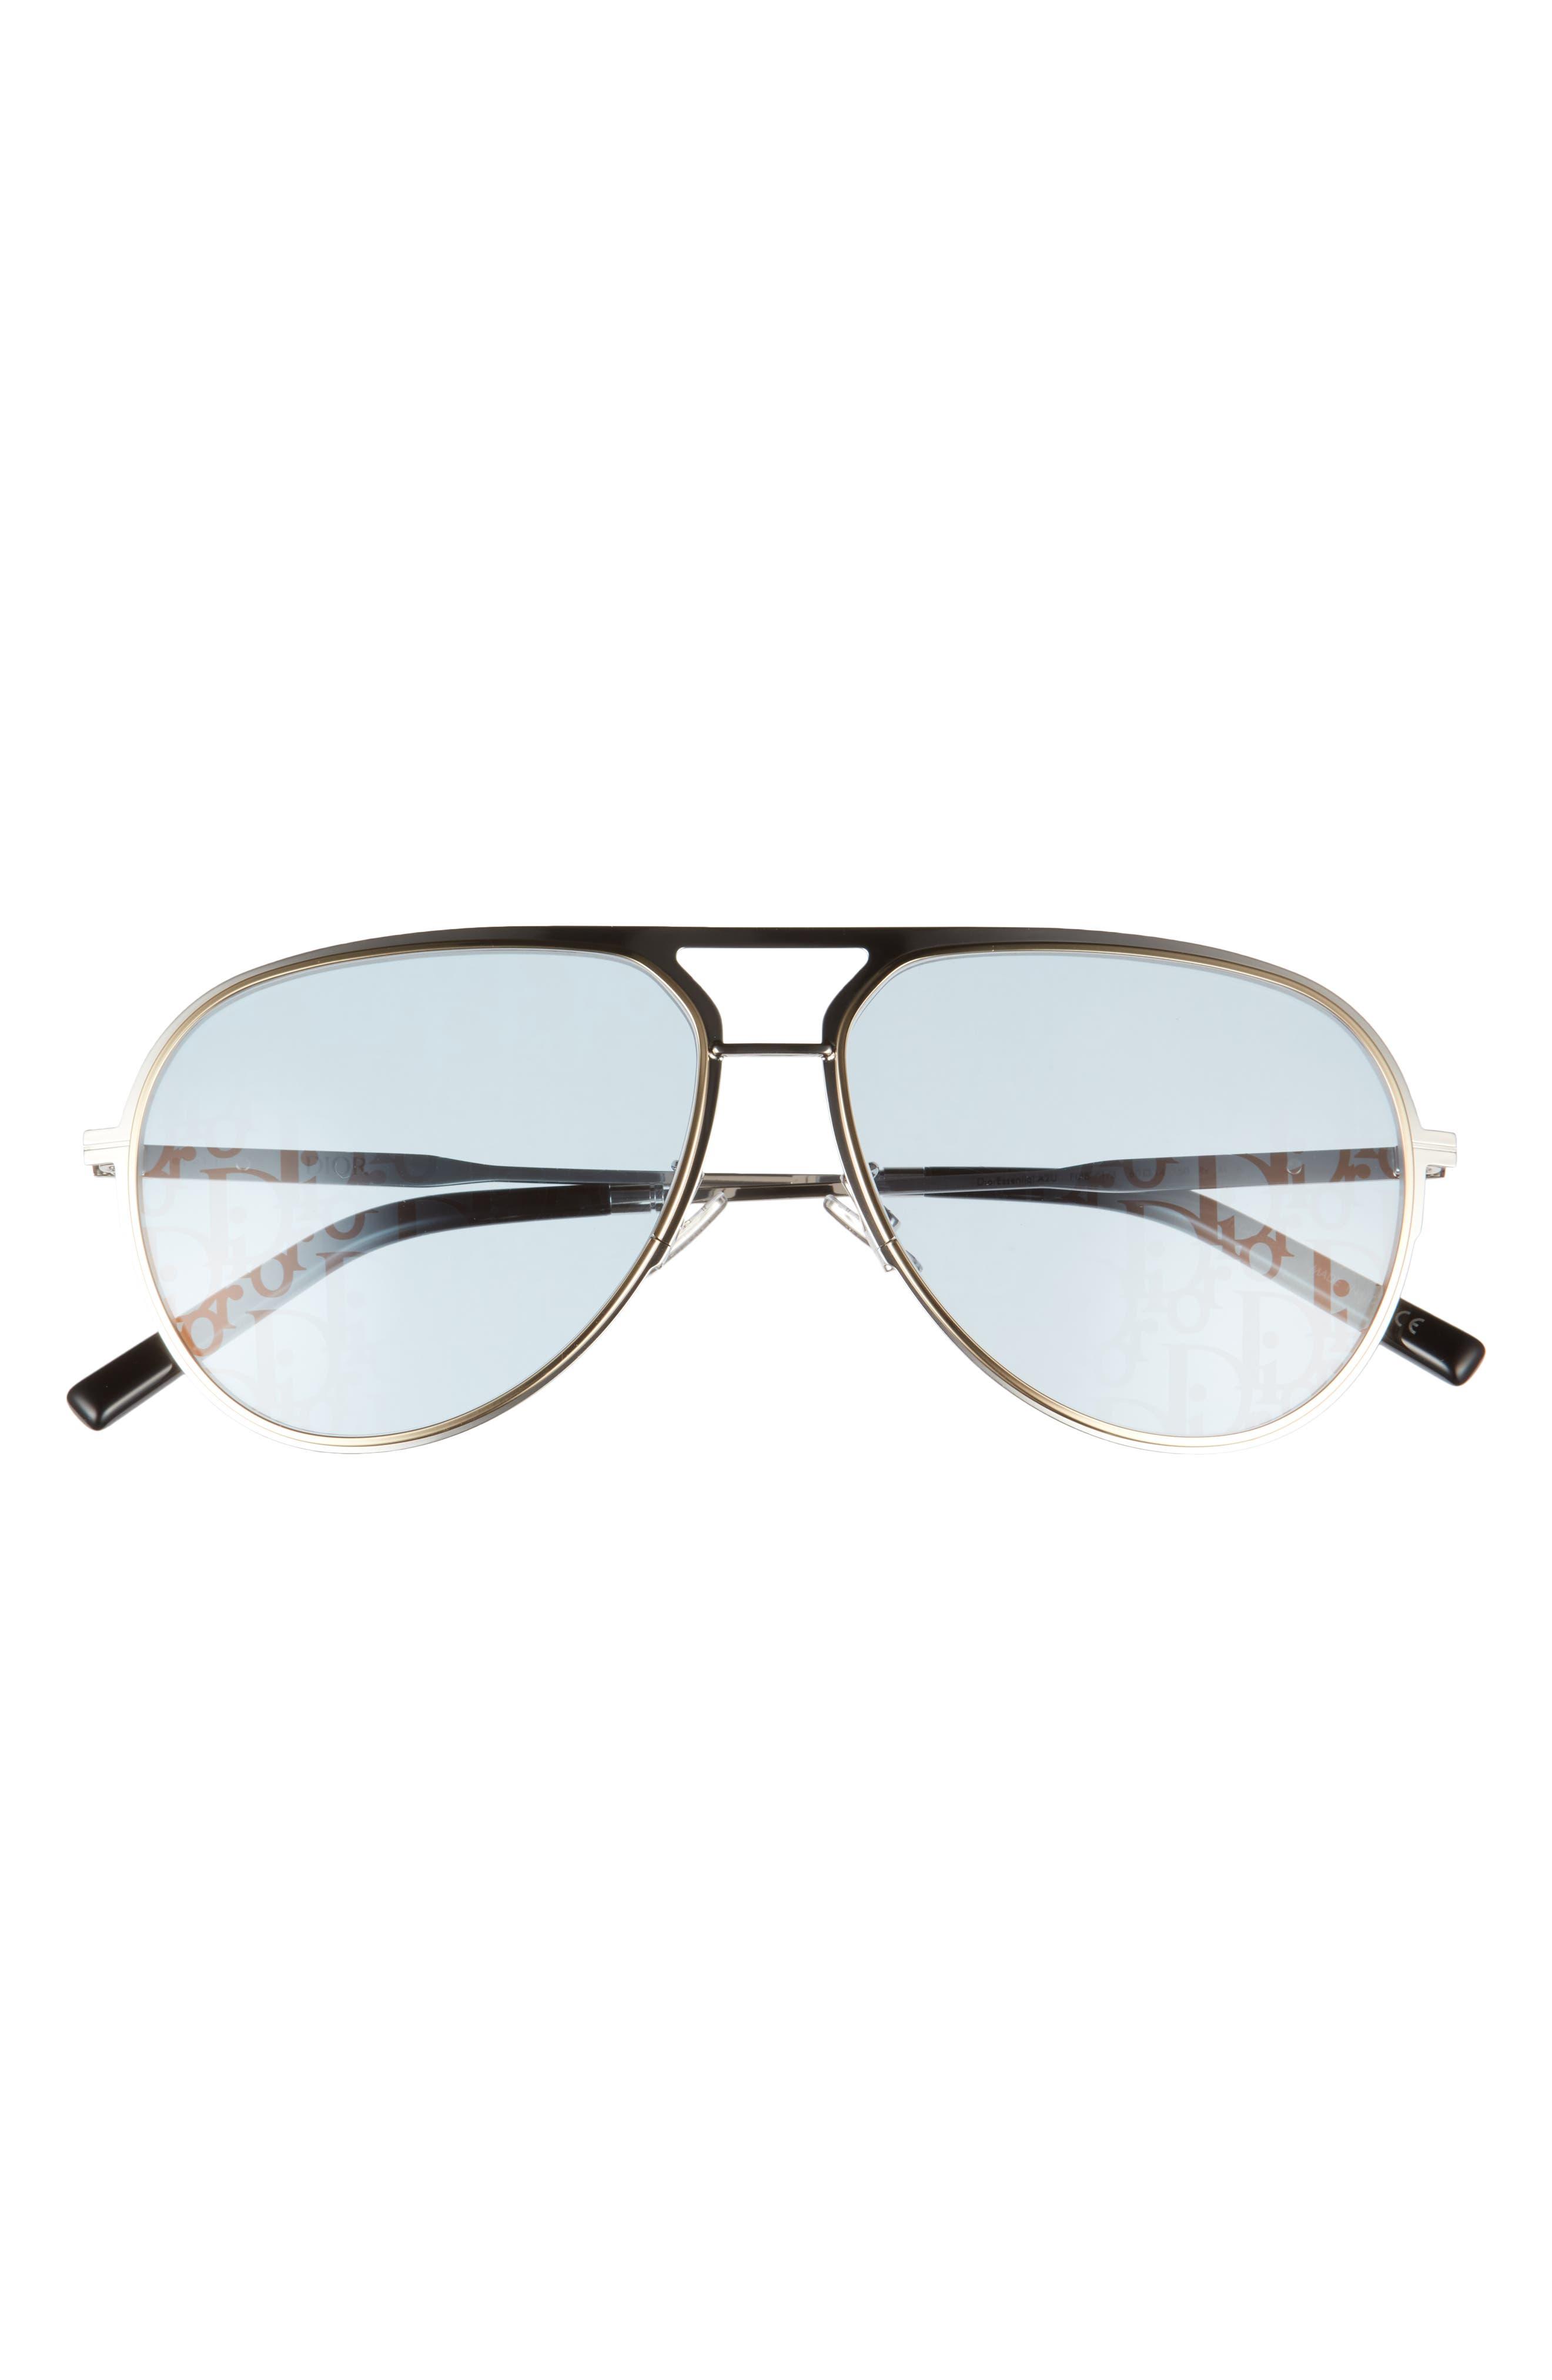 60mm Pilot Sunglasses